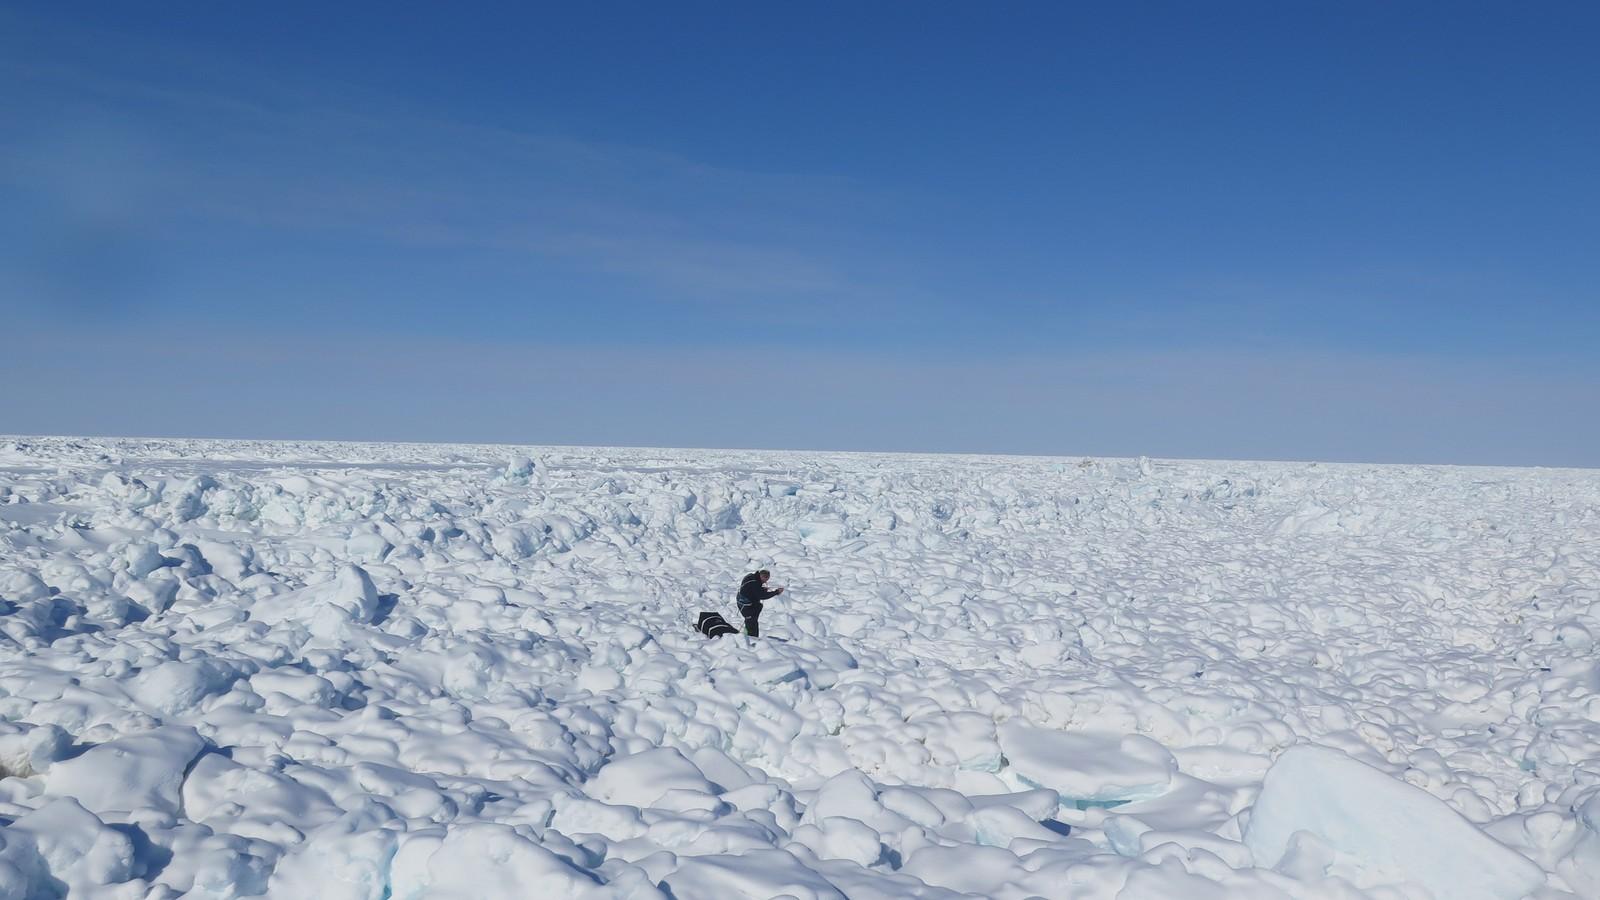 Ufremkommelige partier av is gjorde at de måtte gå til fots og slepe det tunge utstyret i flere kilometer lange partier.